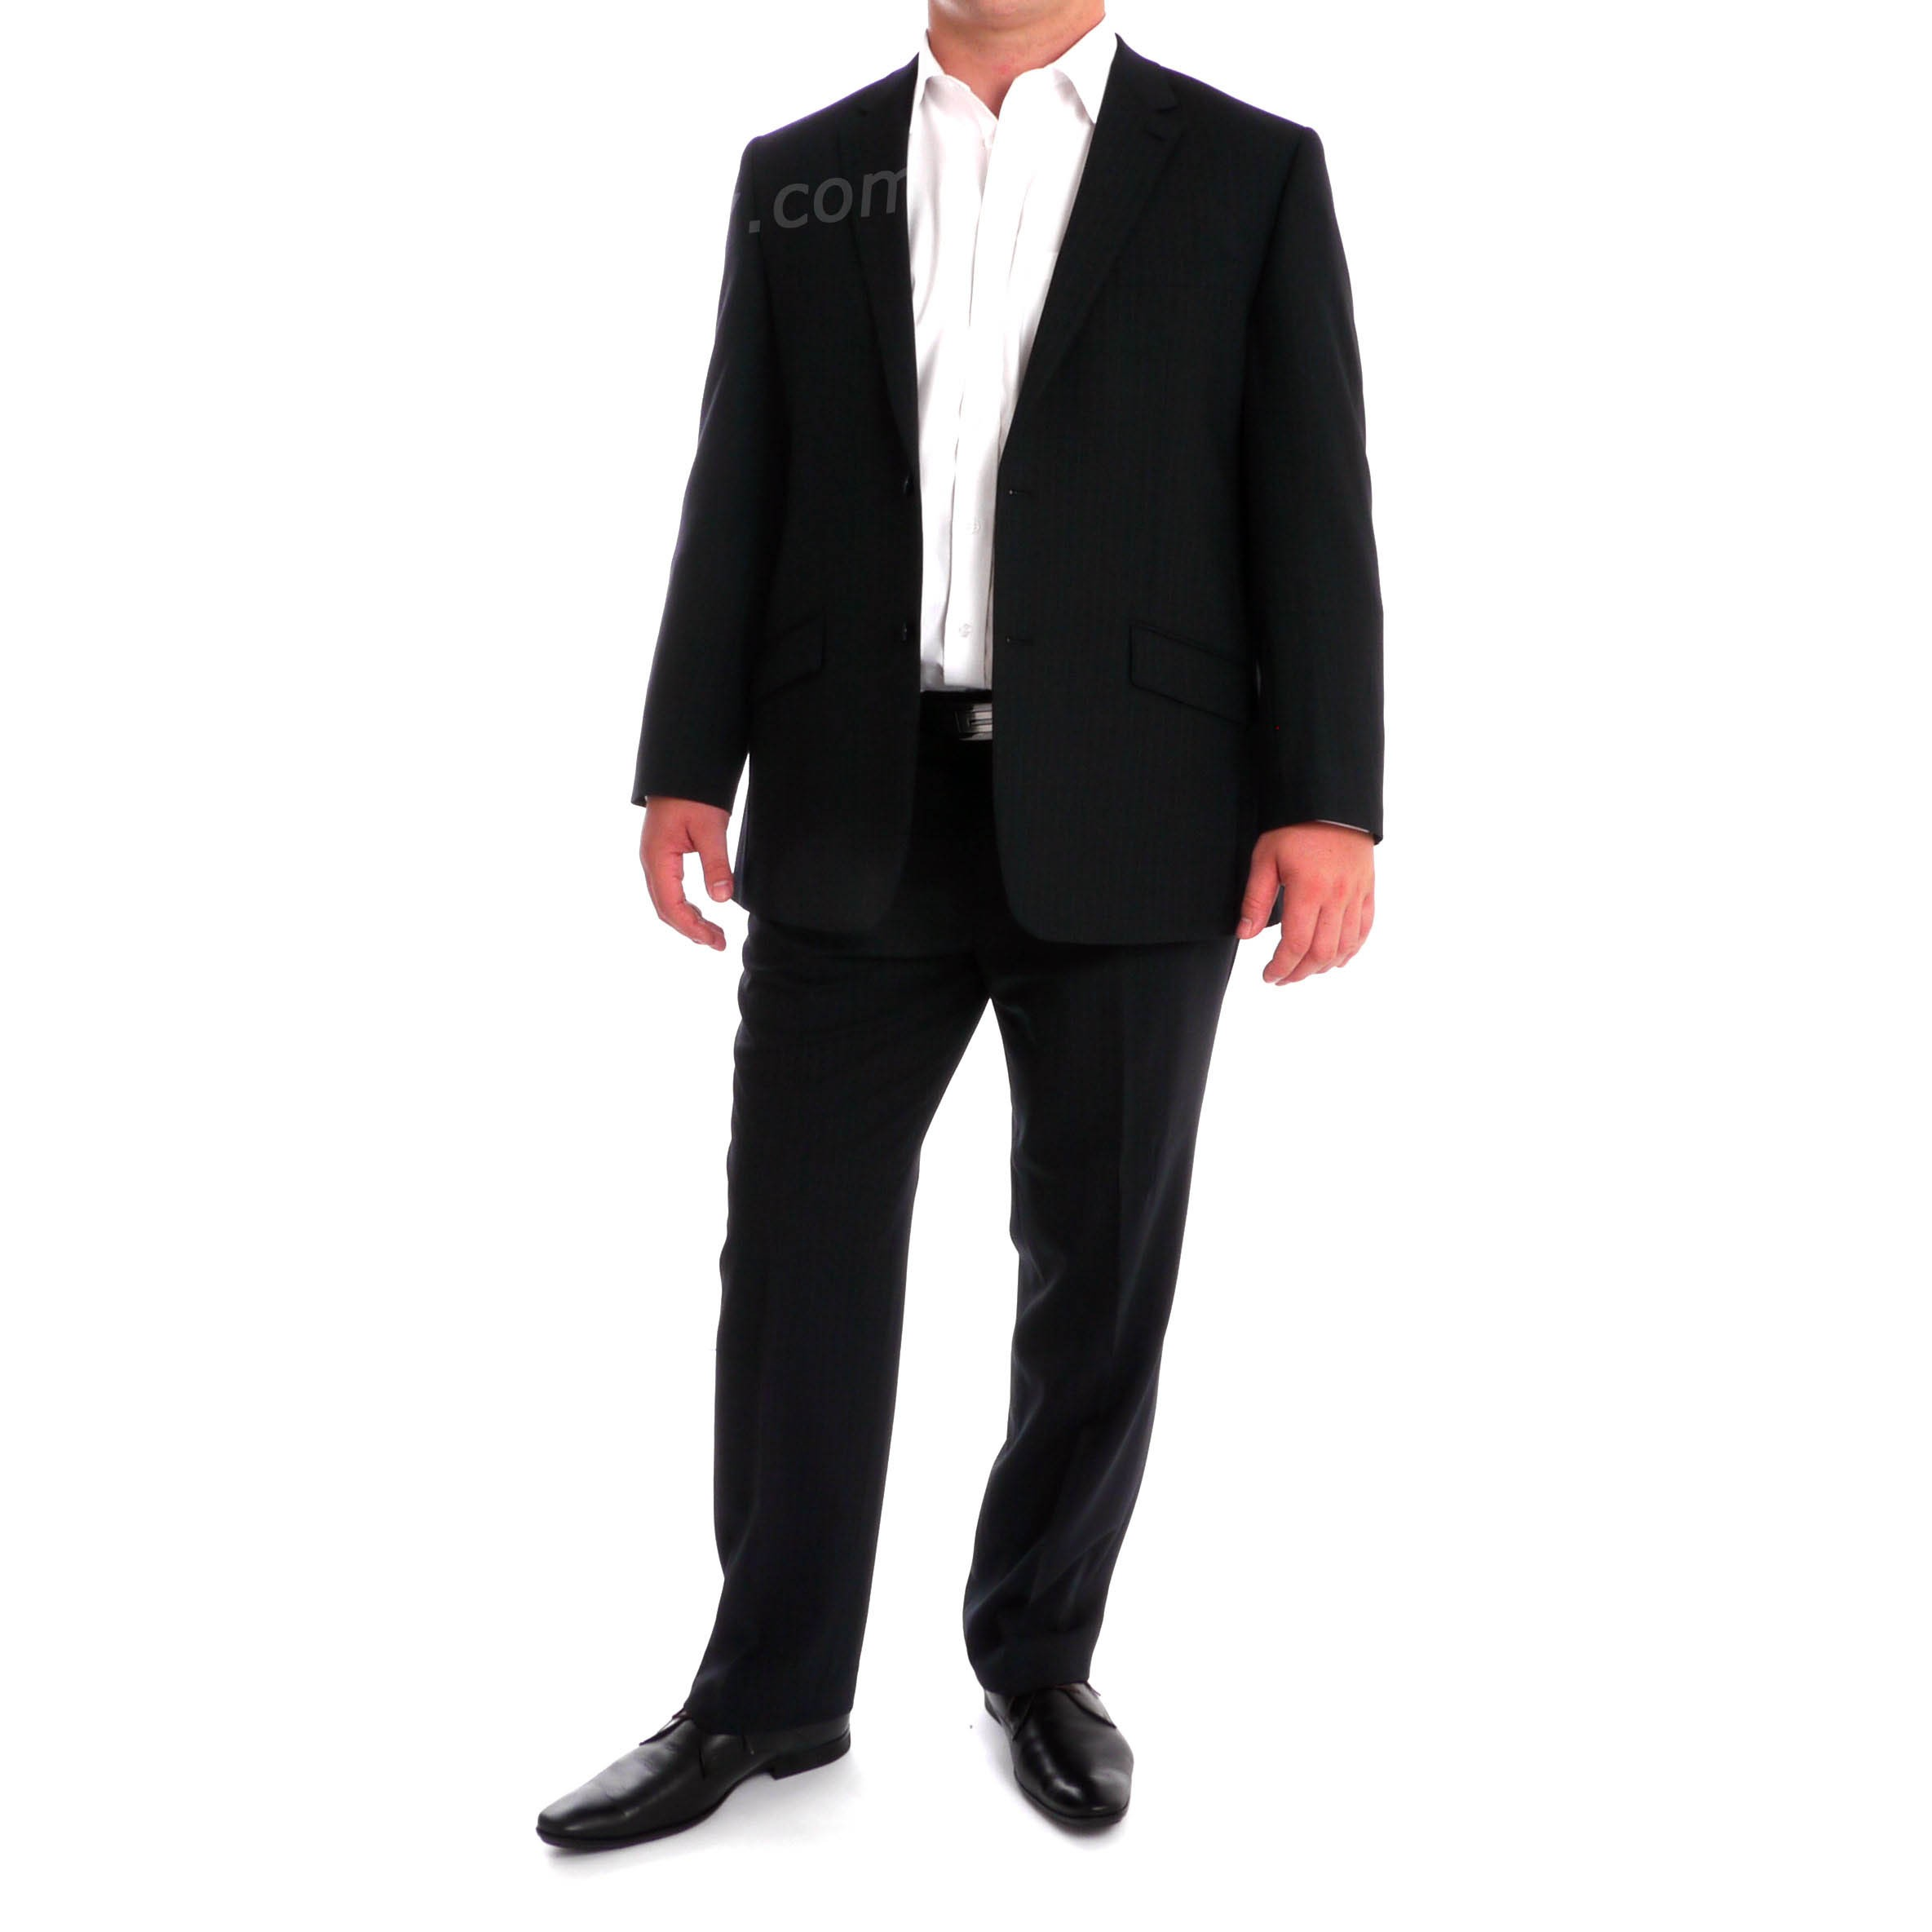 pantalon de costume grande taille classic ray bleu taille courte jusqu 39 au 62 skopes skopes. Black Bedroom Furniture Sets. Home Design Ideas